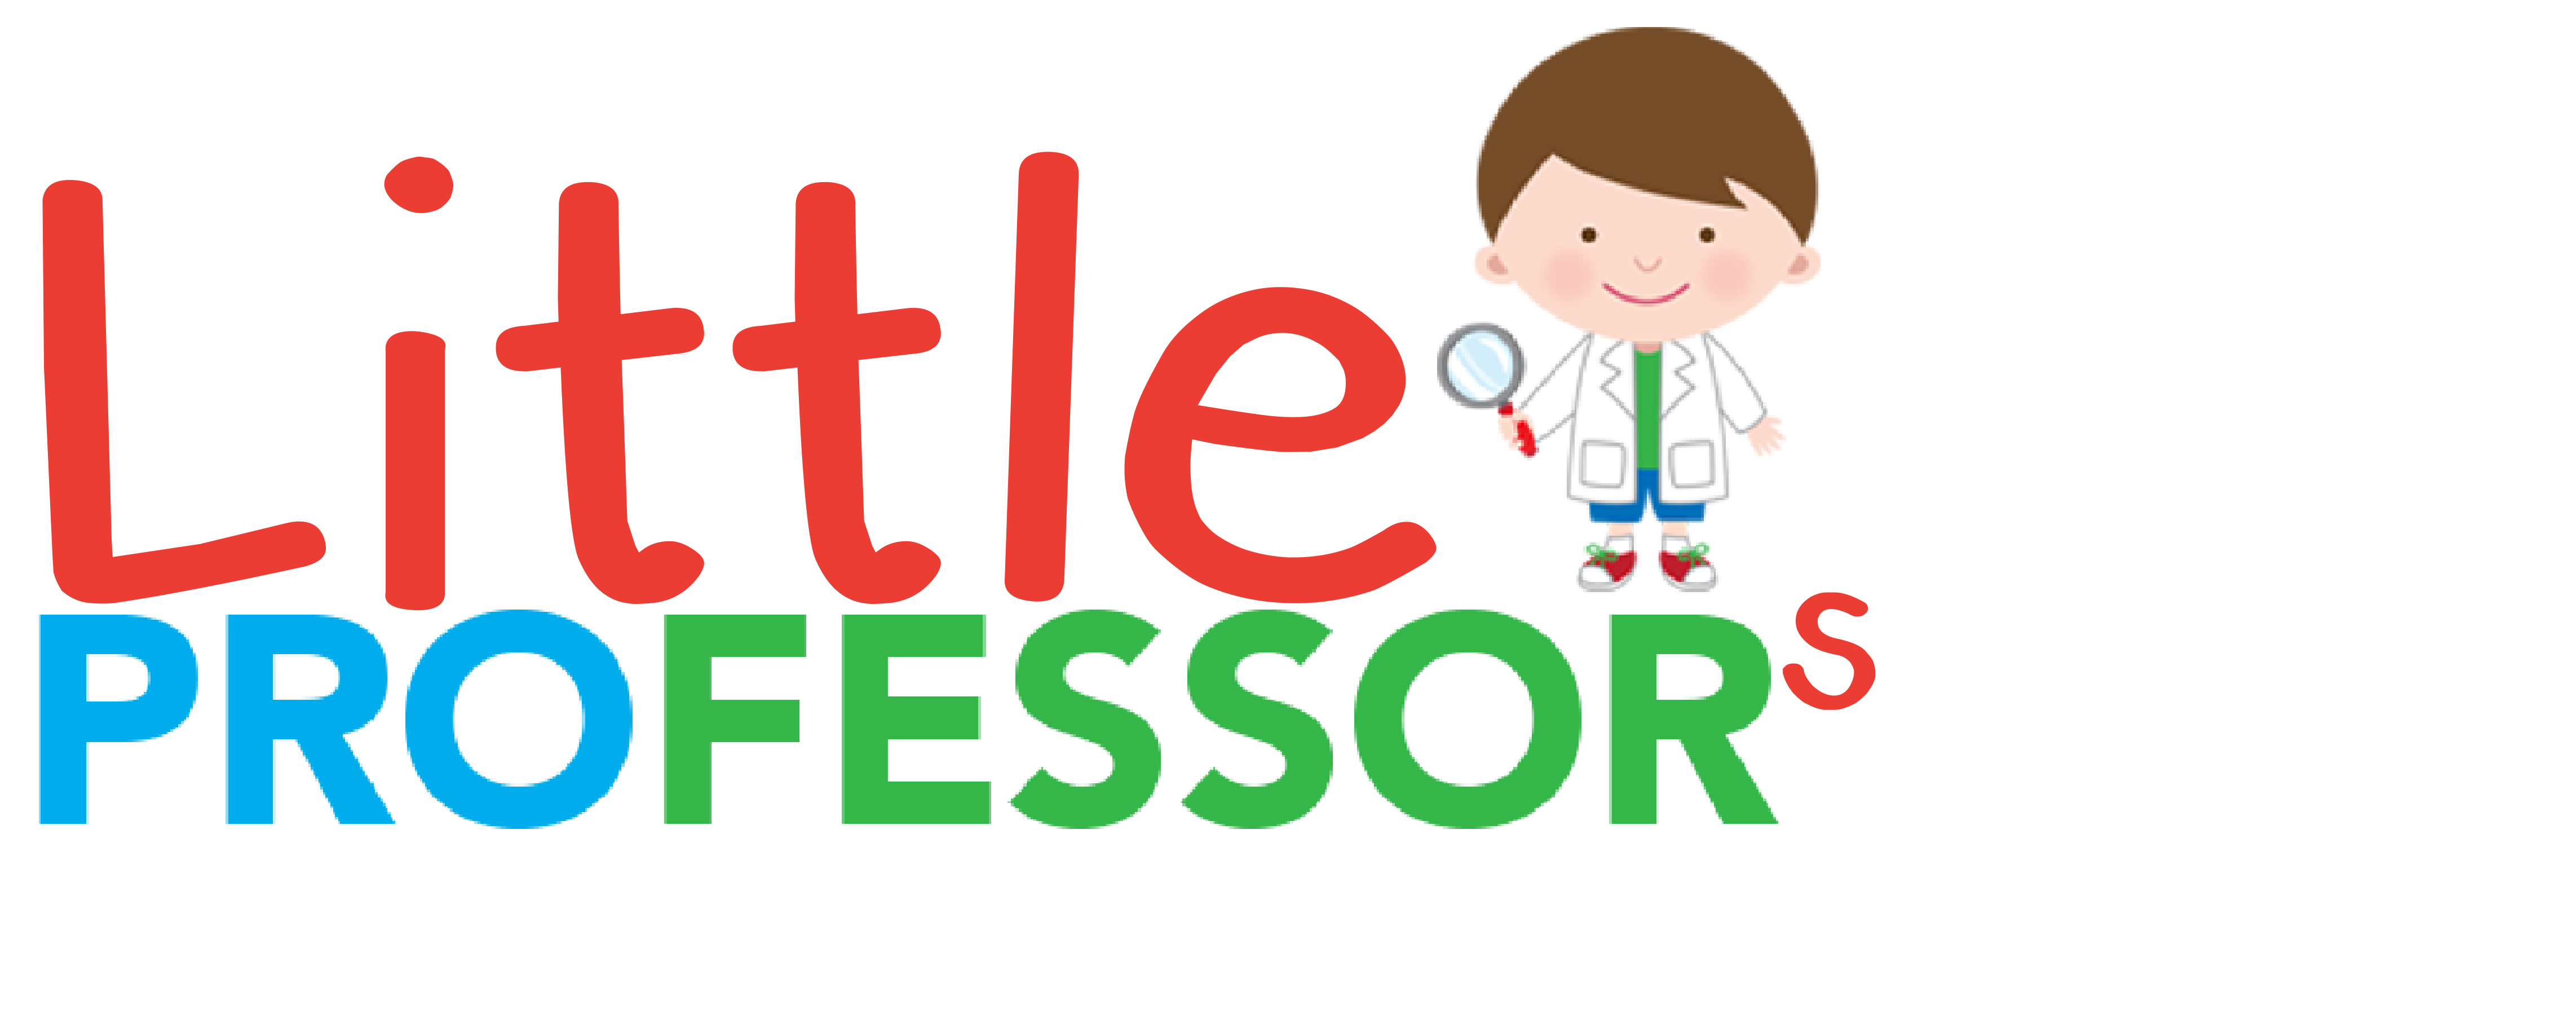 Little professors steam classes. Explorer clipart paleontologist